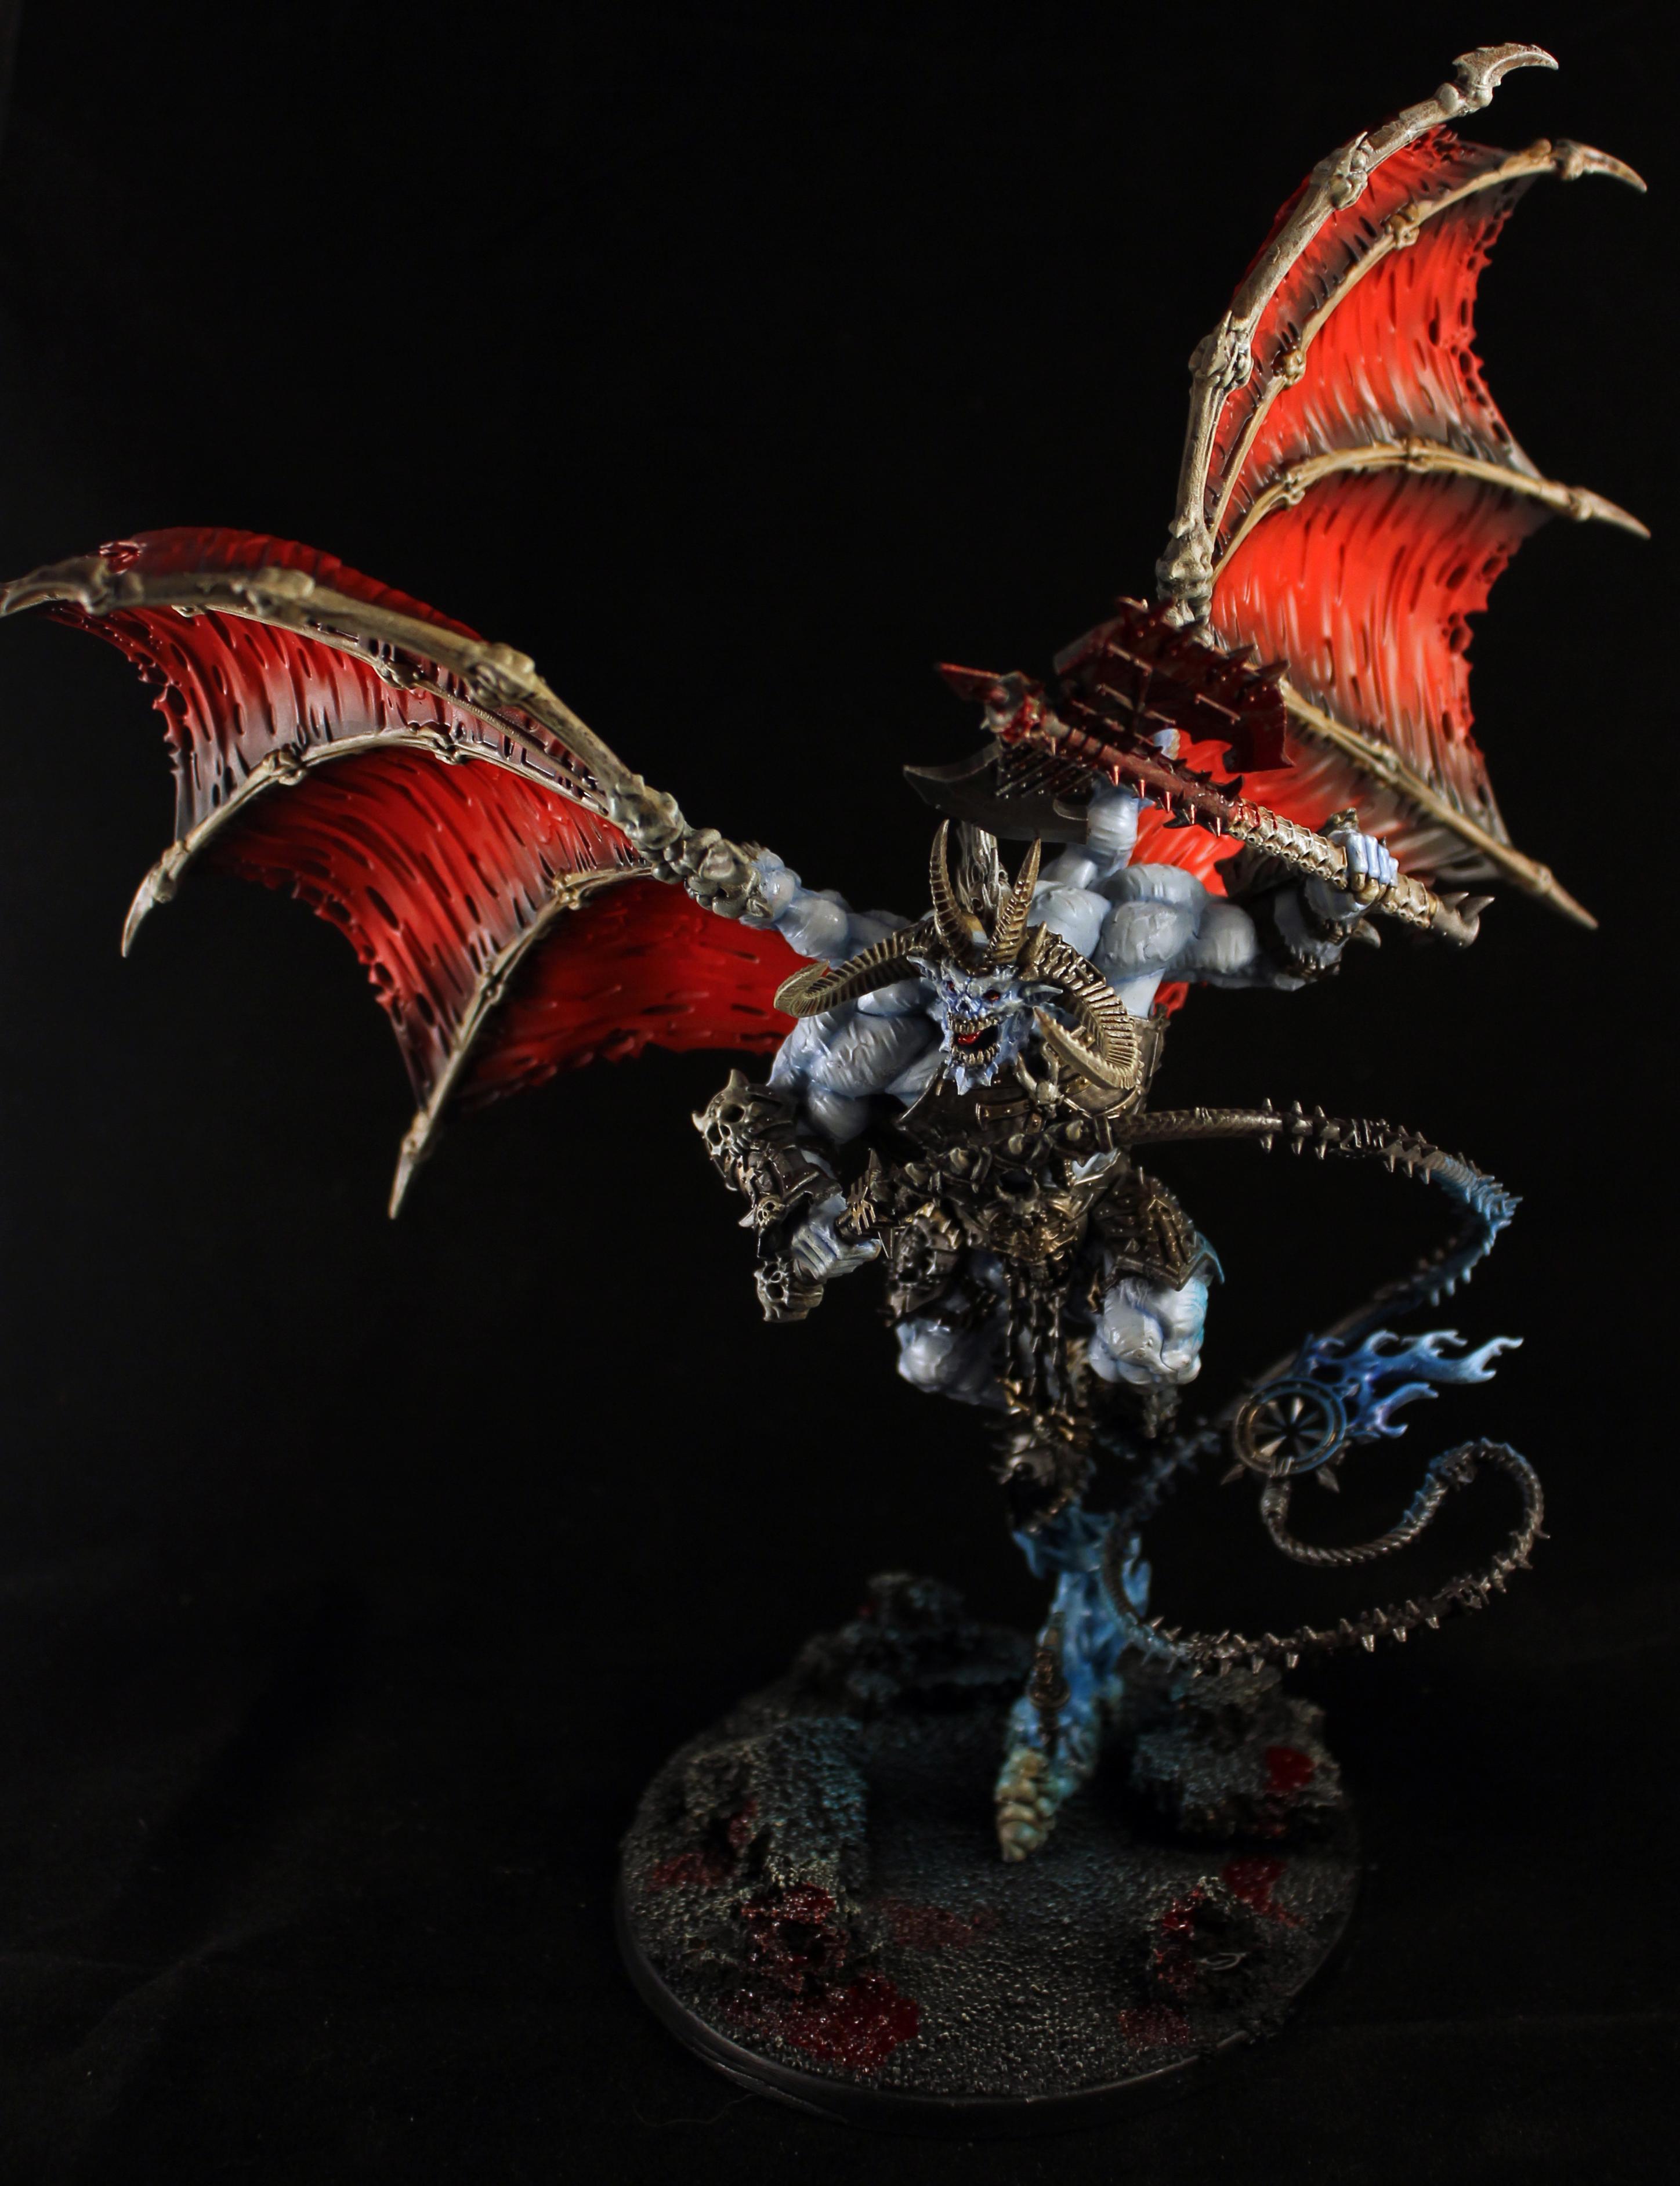 Bloodthirster, Chaos, Chaos Daemons, Chaos Deamon, Daemons, Khorne, Warhammer 40,000, Warhammer Fantasy